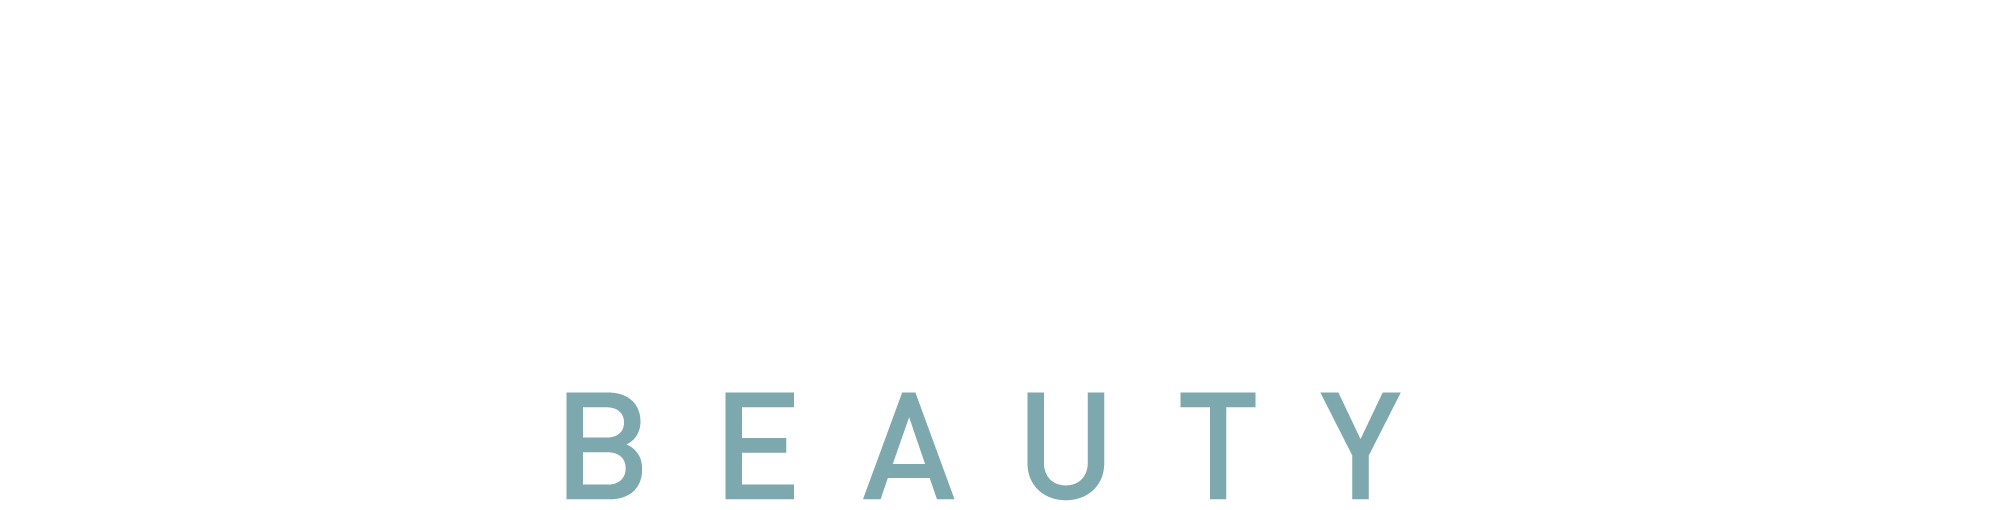 Azzurro Beauty